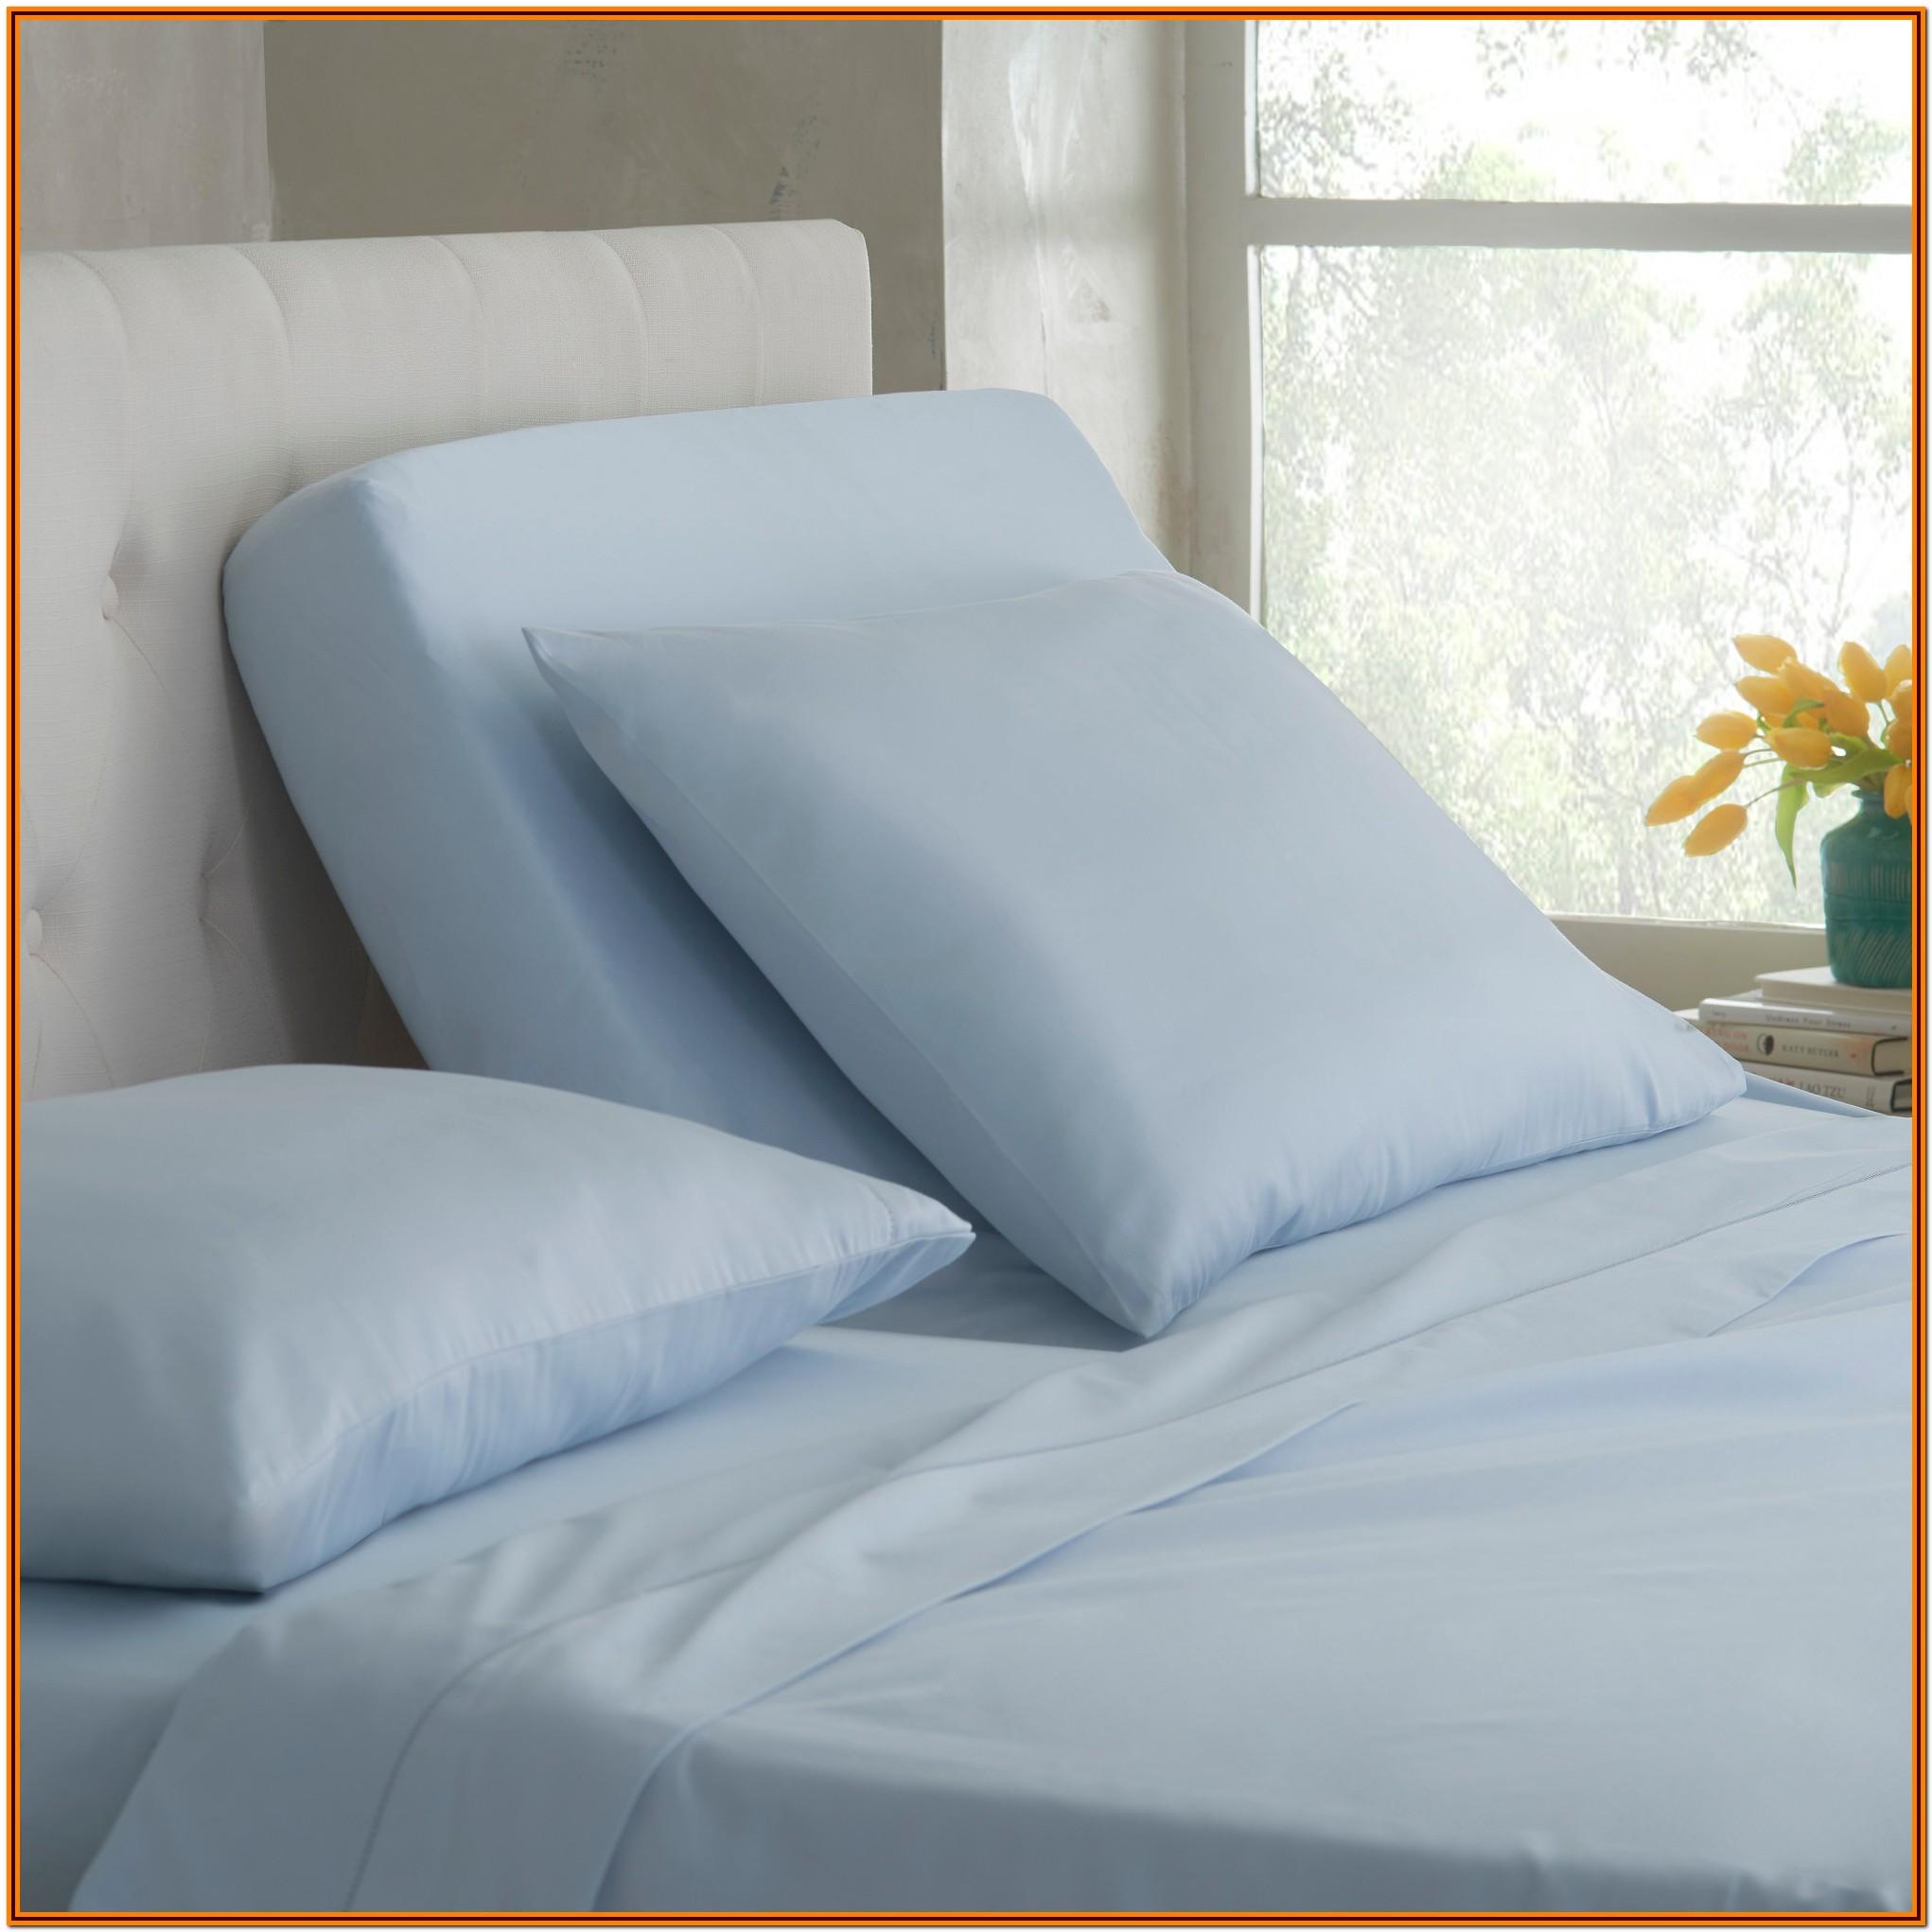 Sheets For Split King Size Bed